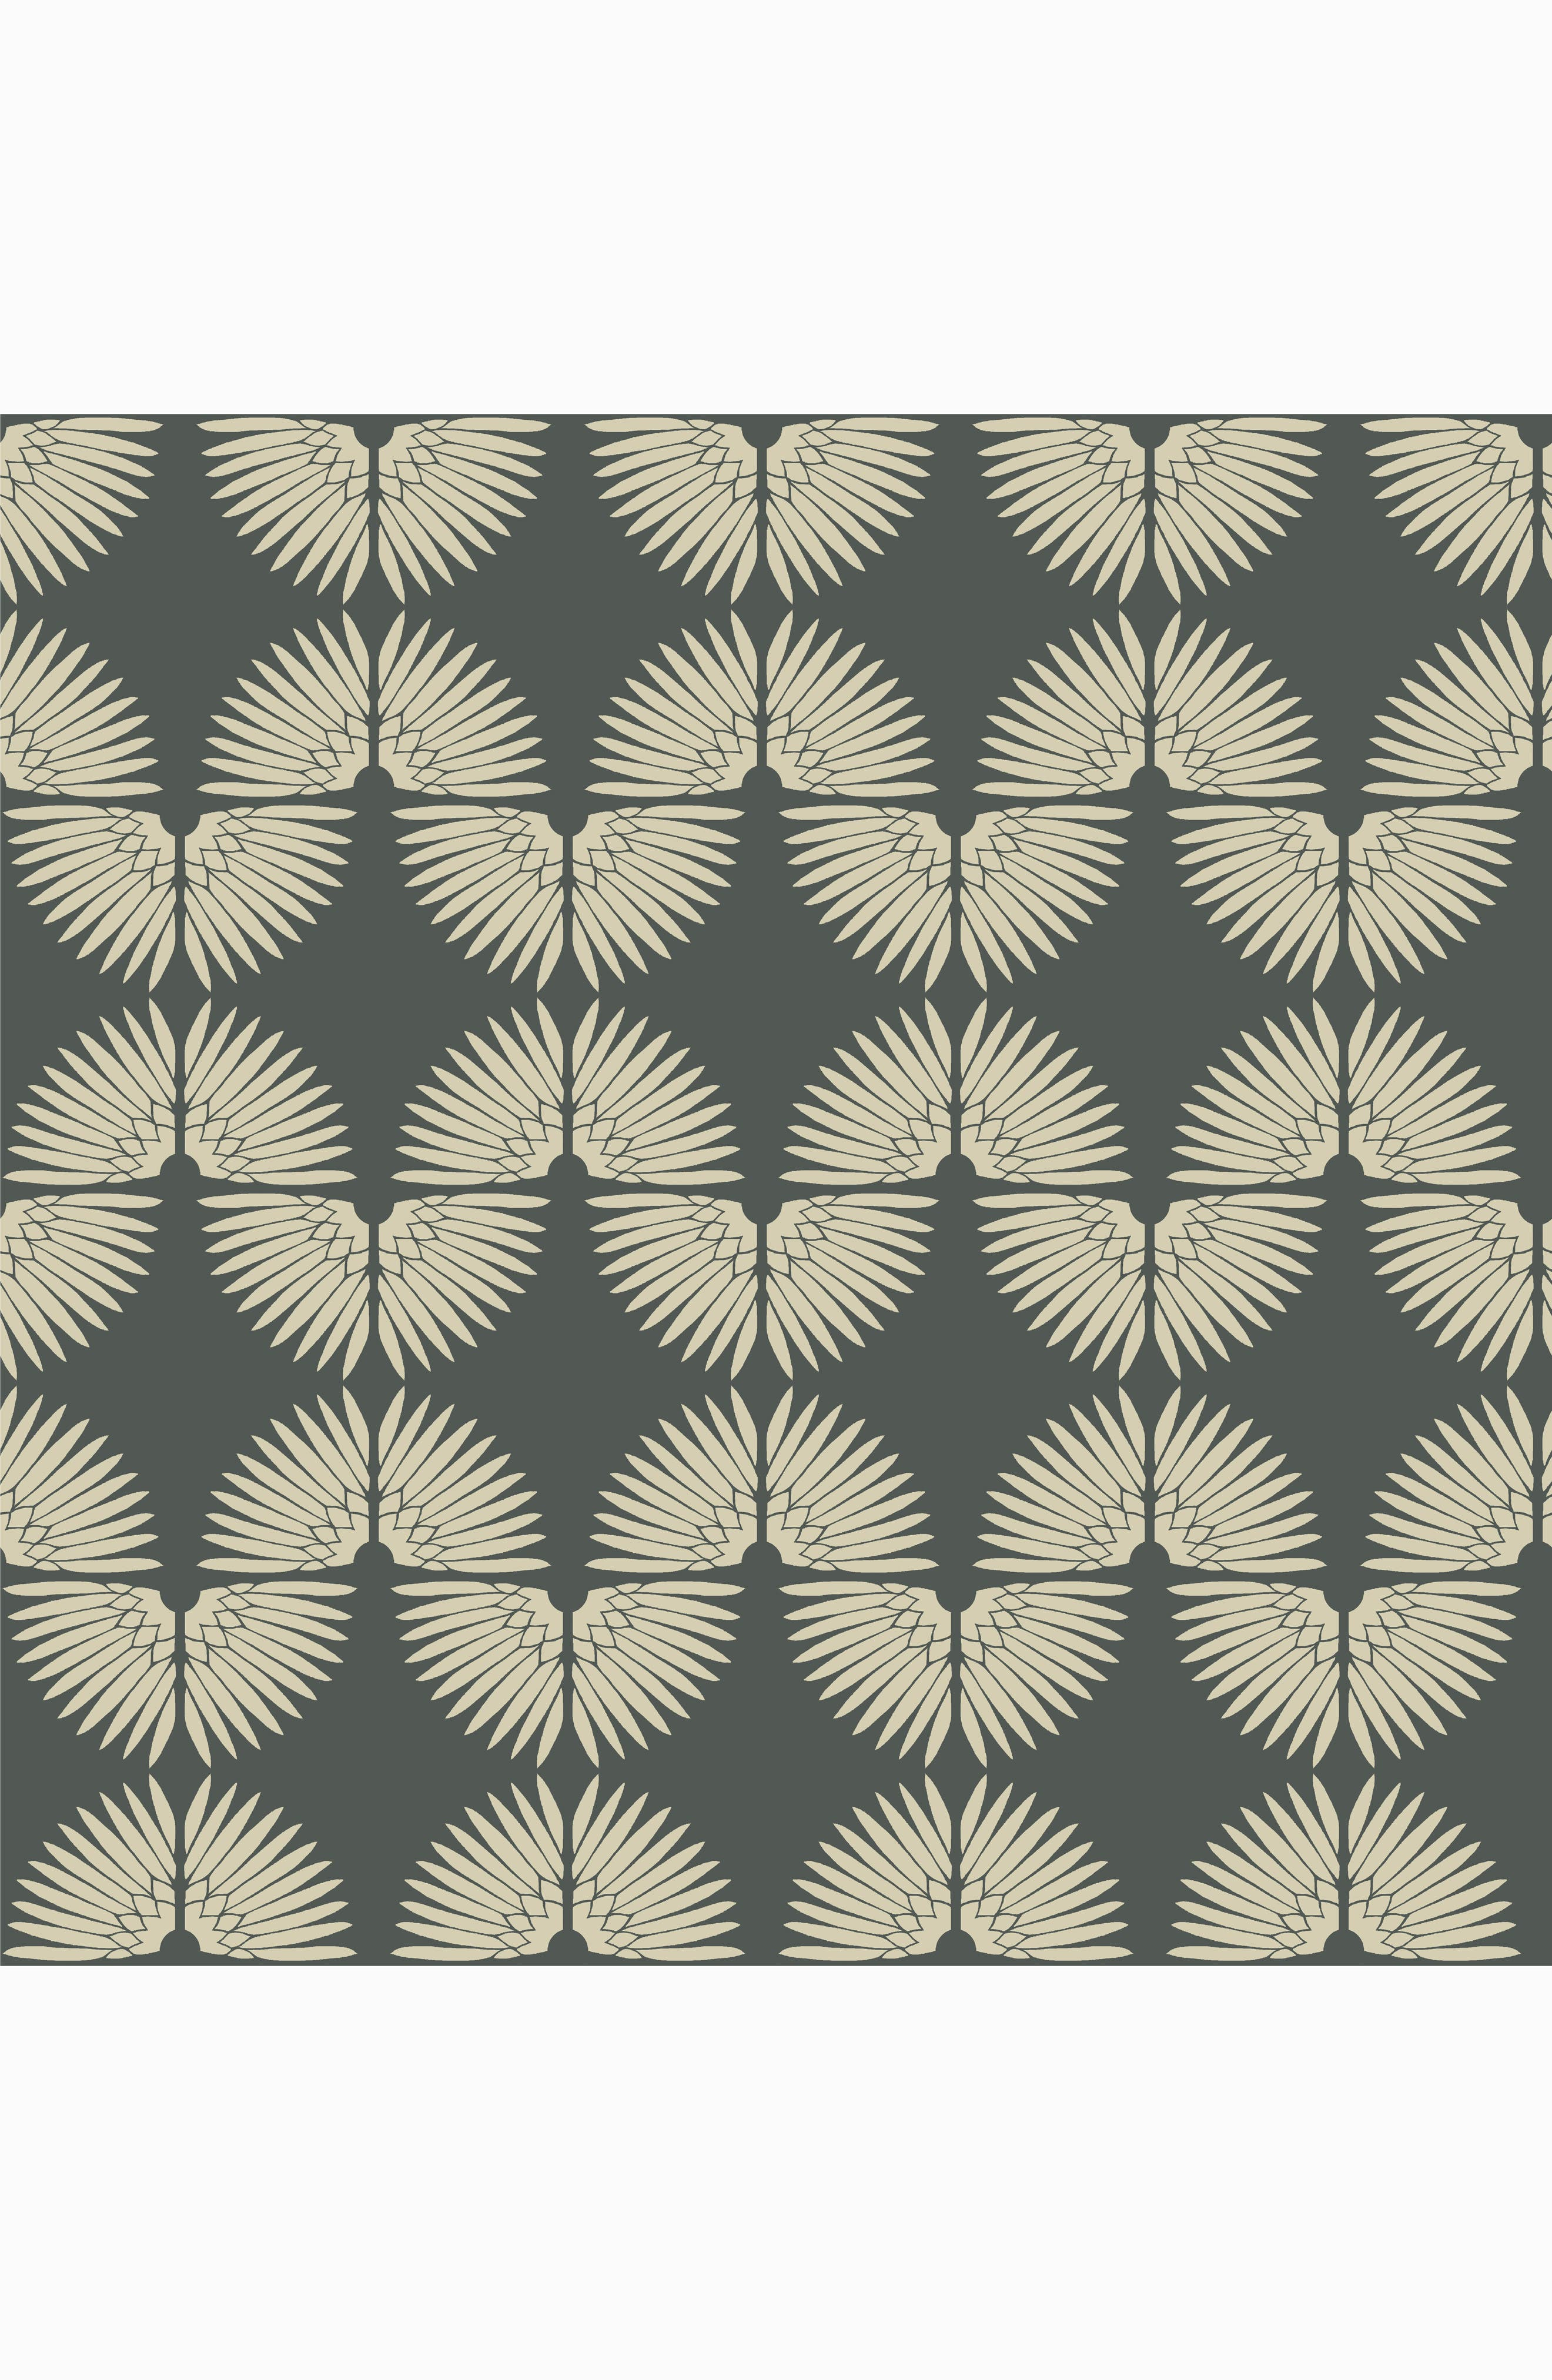 Urban Caterpillar Self-Adhesive Vinyl Wallpaper,                             Main thumbnail 1, color,                             Angel White